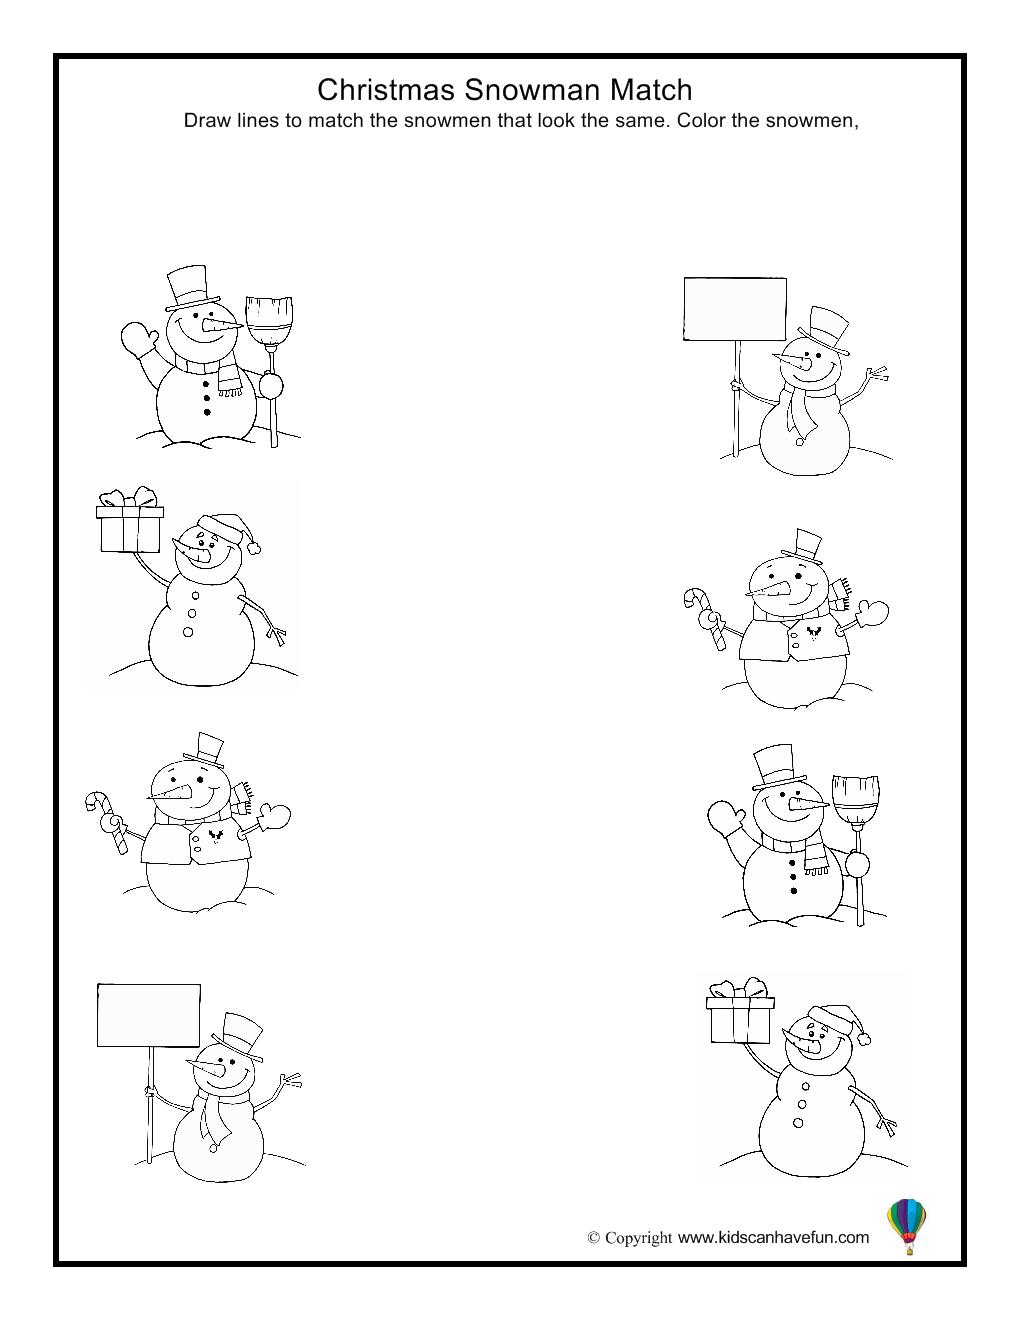 Christmas Snowman Match Worksheet | Inverno Pré-Escolar